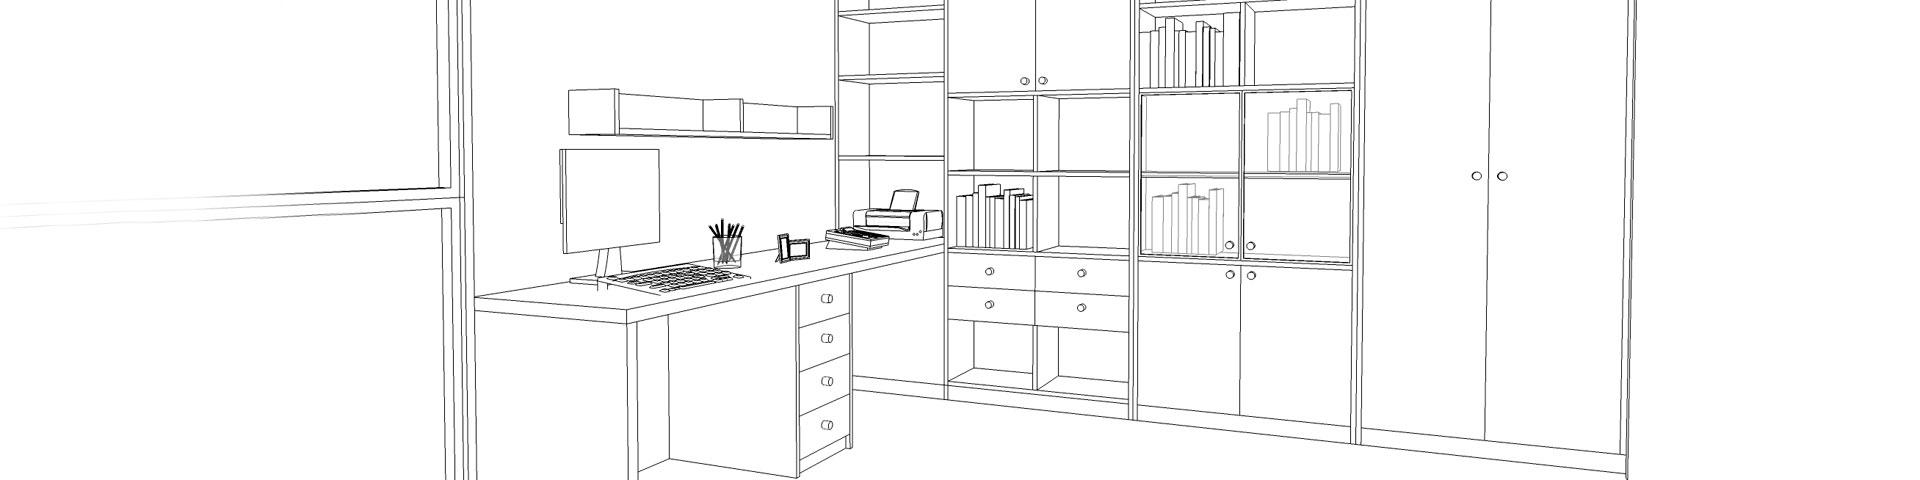 Diseño de muebles 3D en melamina. Proyectos de diseño 3D